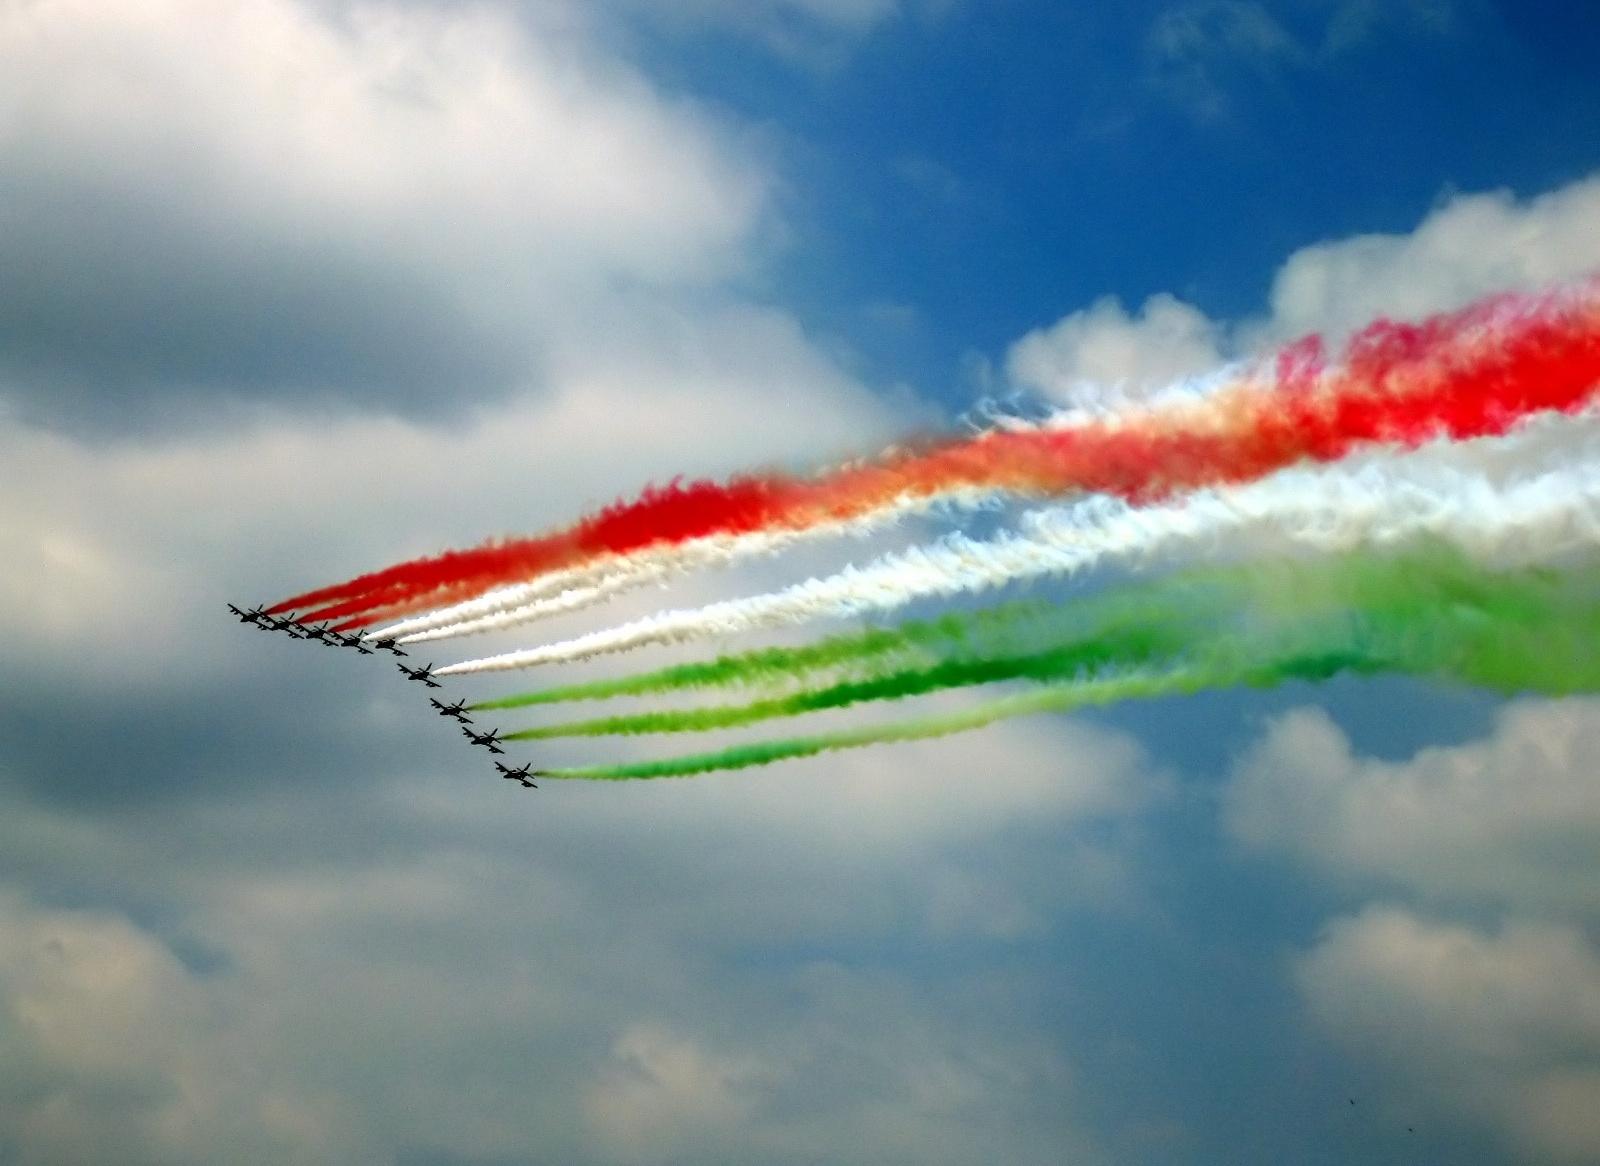 Indian Air Force Salute Formation Aircraft Wallpaper 2933 Aeronefnet